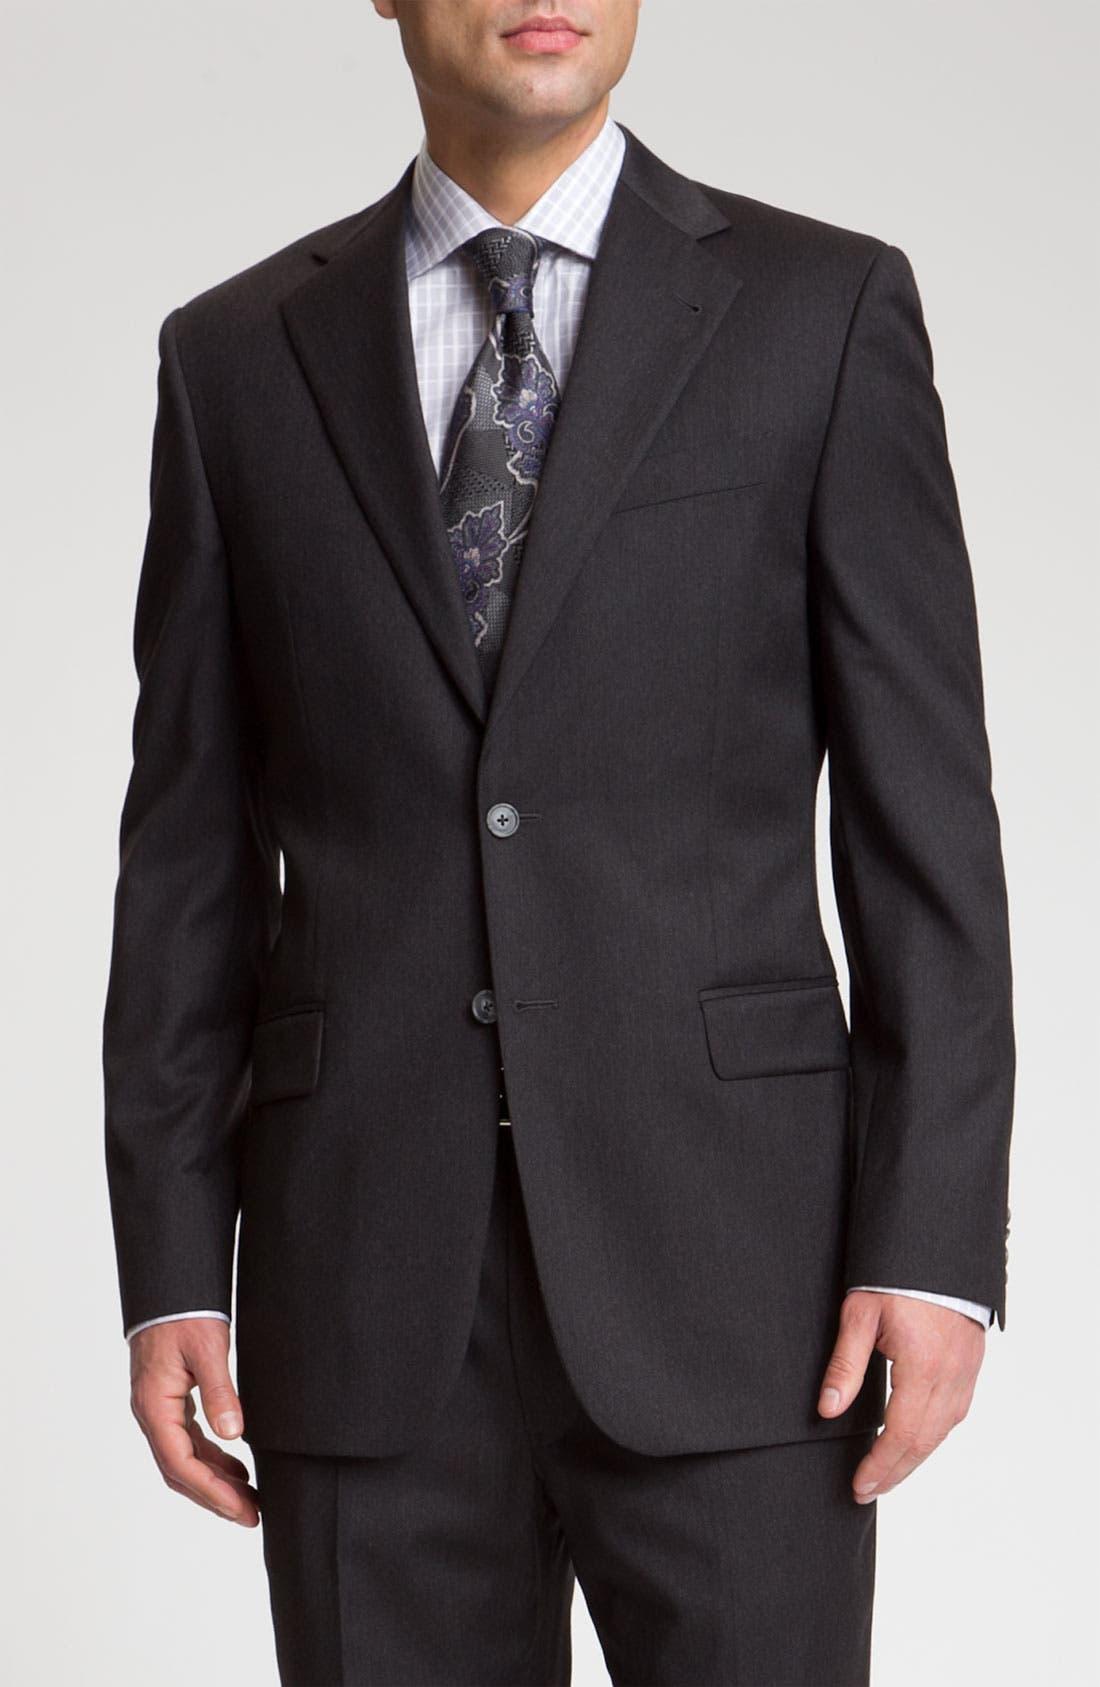 Main Image - Joseph Abboud 'Signature Silver' Dark Grey Wool Suit